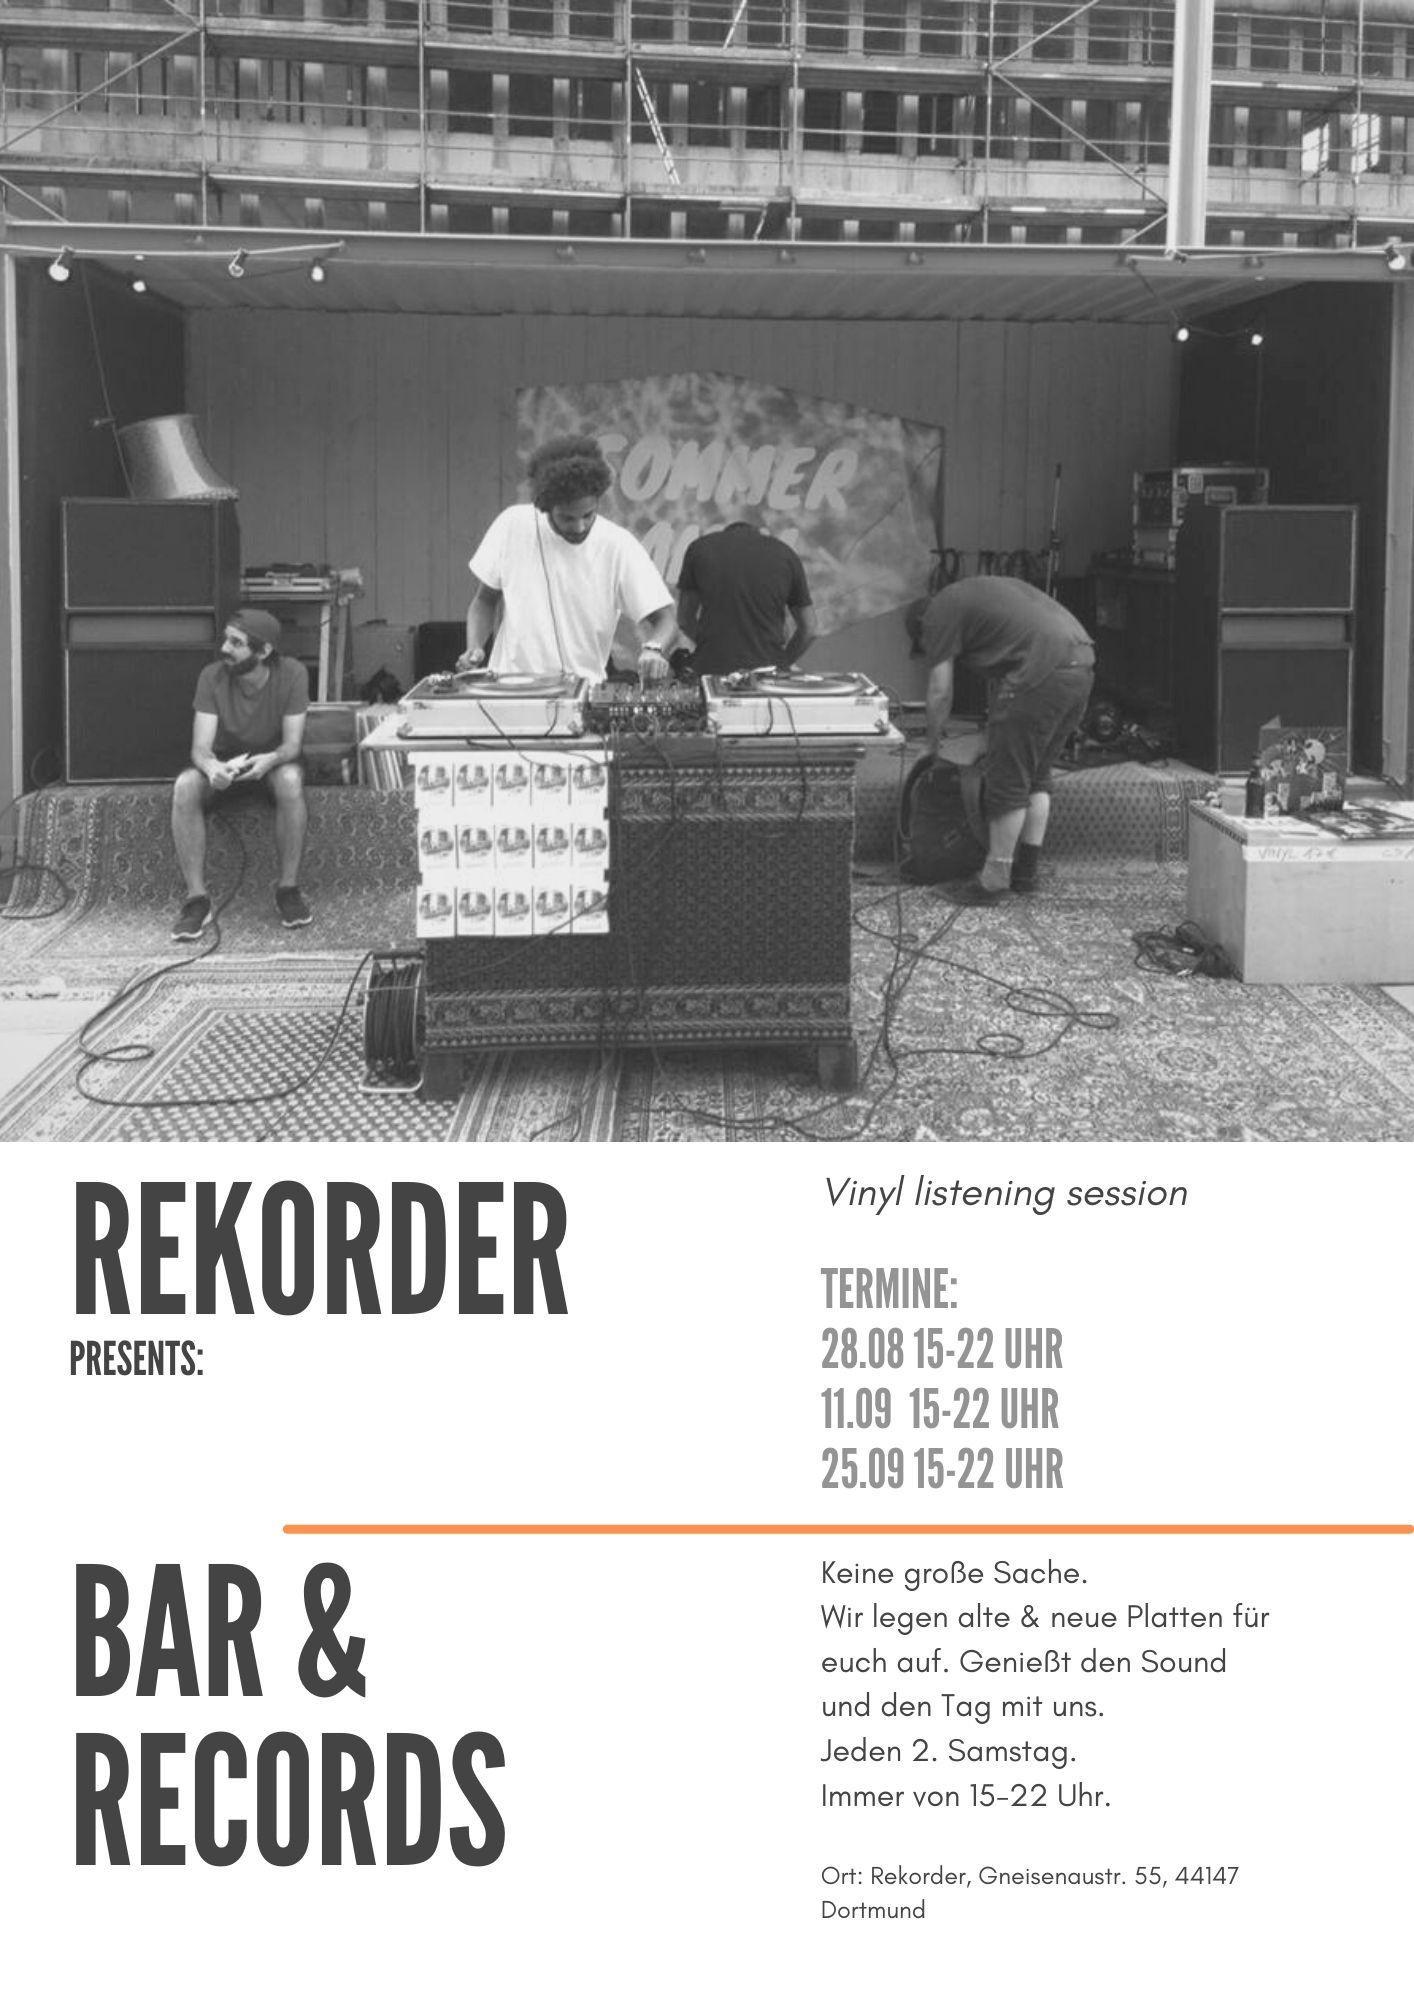 Bar & Records